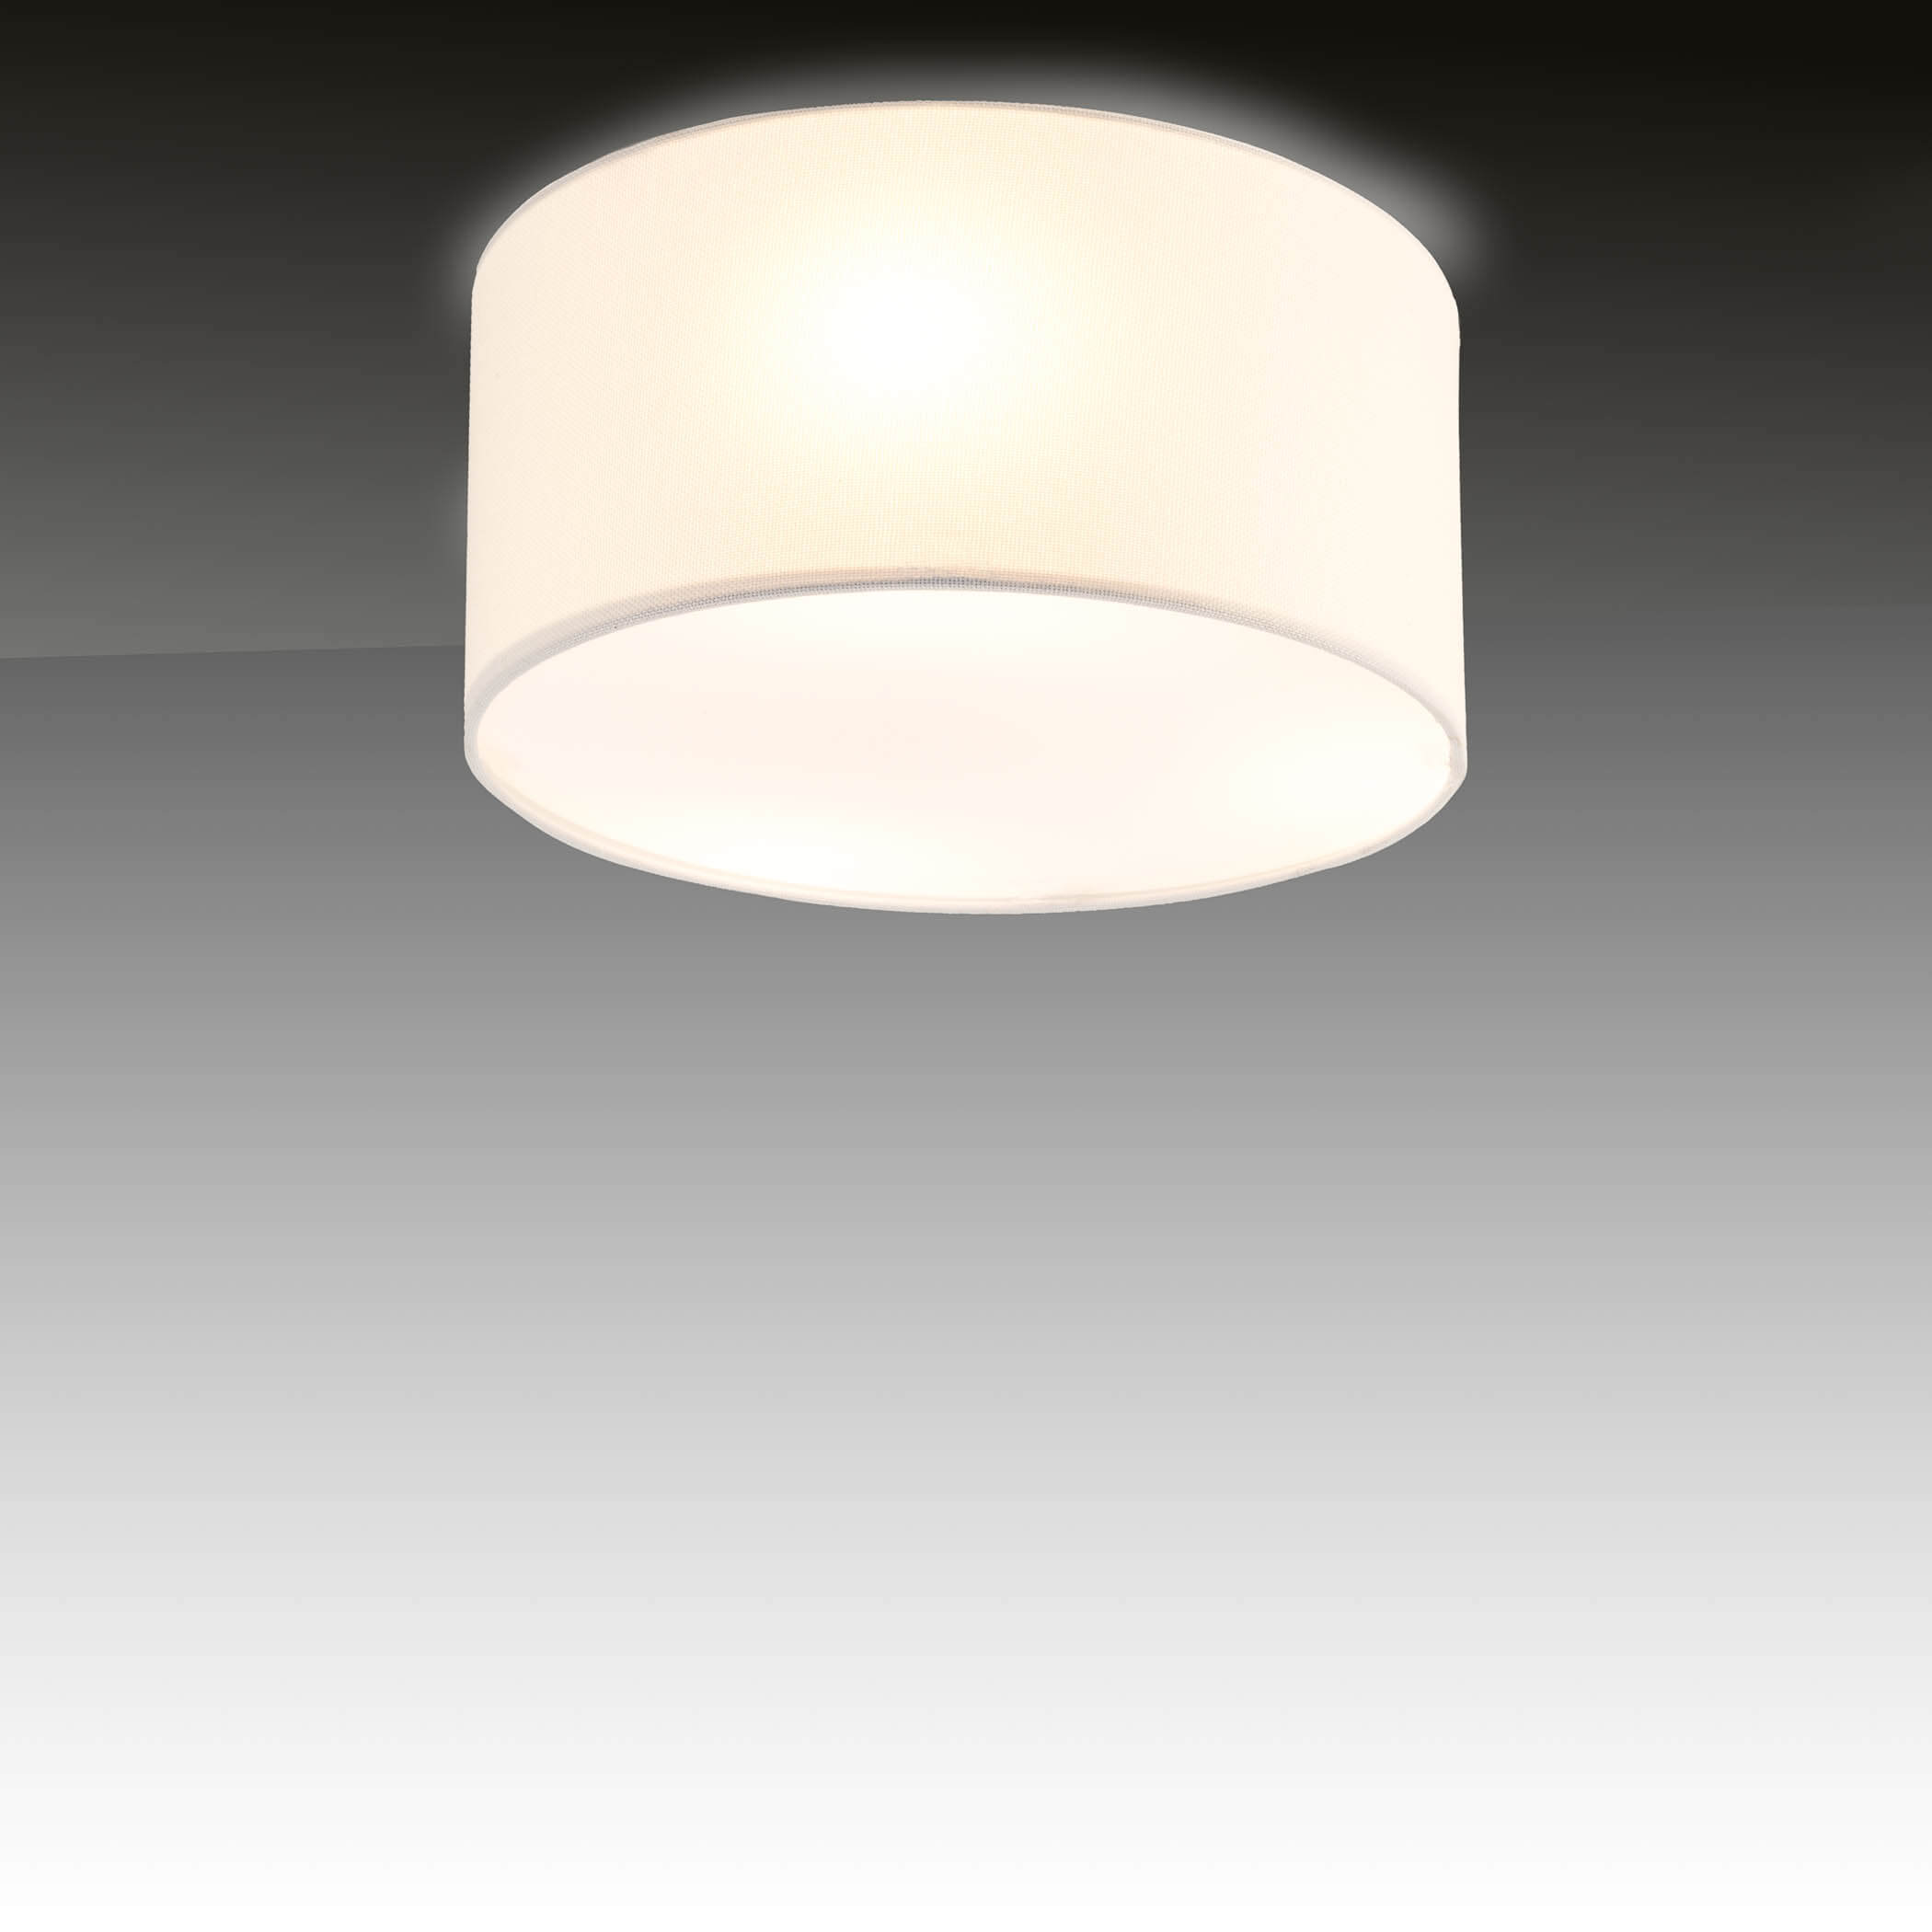 Deckenleuchte ZDL E27 TW A inkl.LED